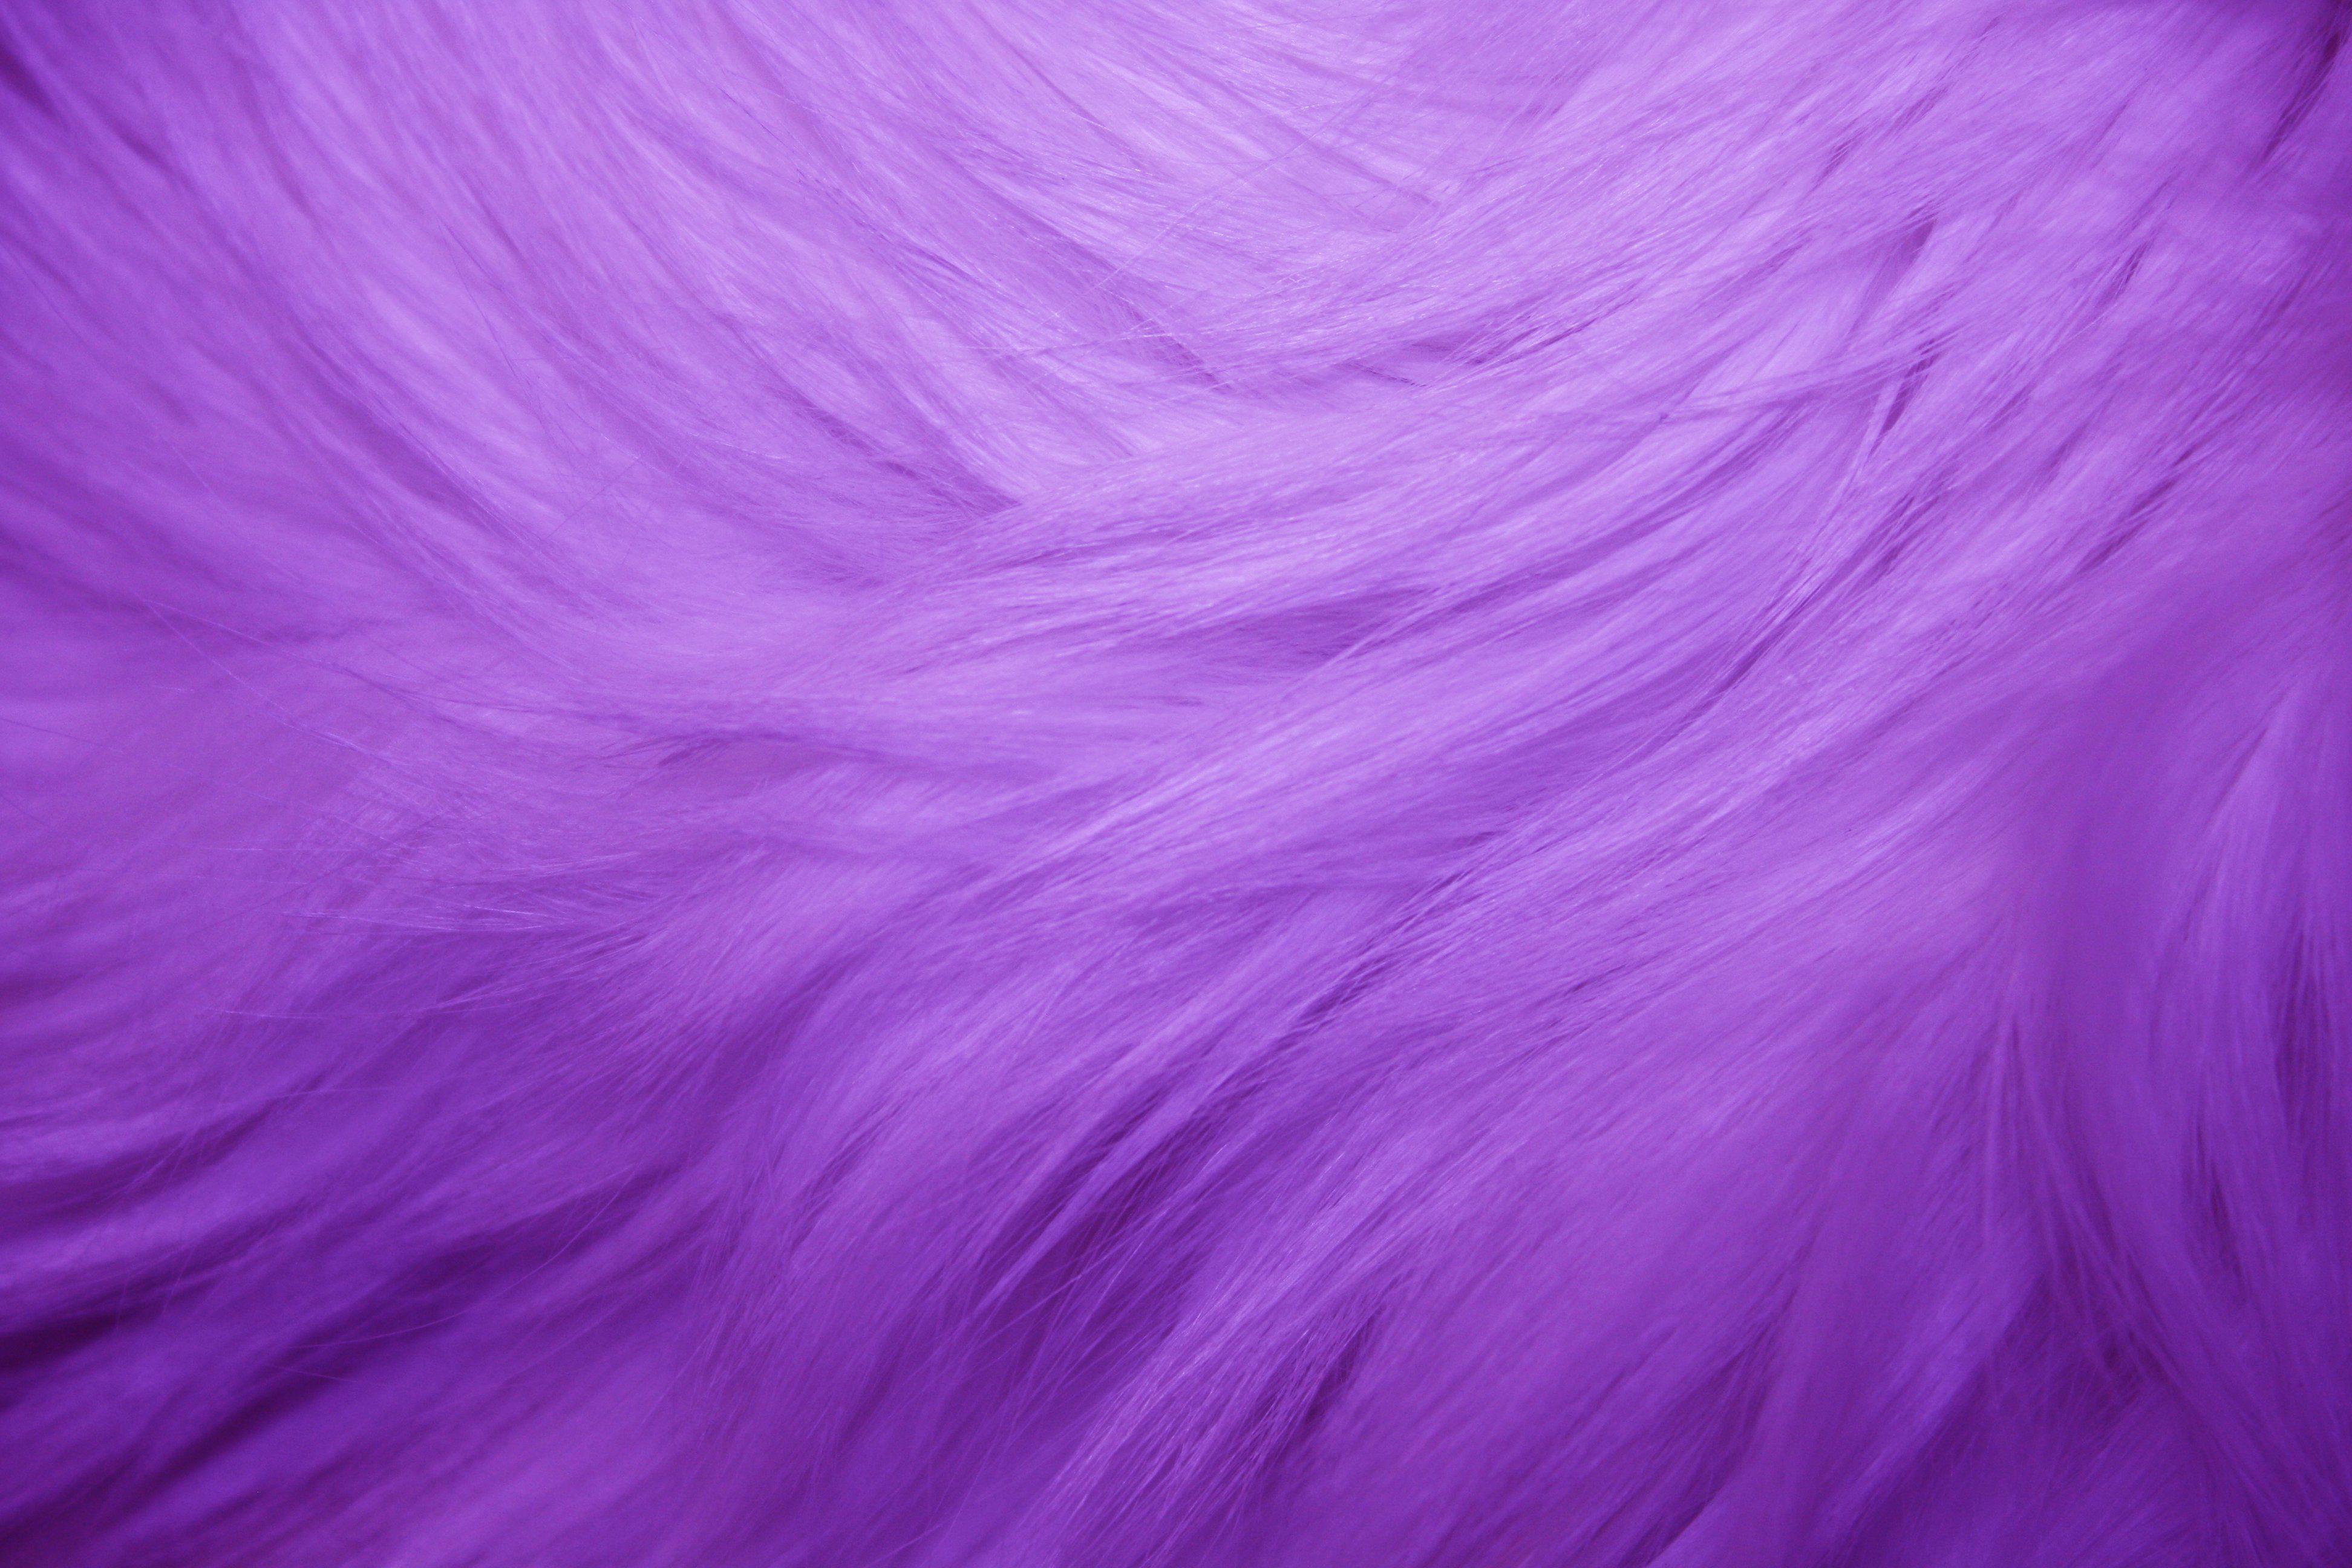 Purple Fur Purple Fur Texture Free High Resolution Photo Dimensions 3888 Fur Textures Fur Background Pink Fur Wallpaper